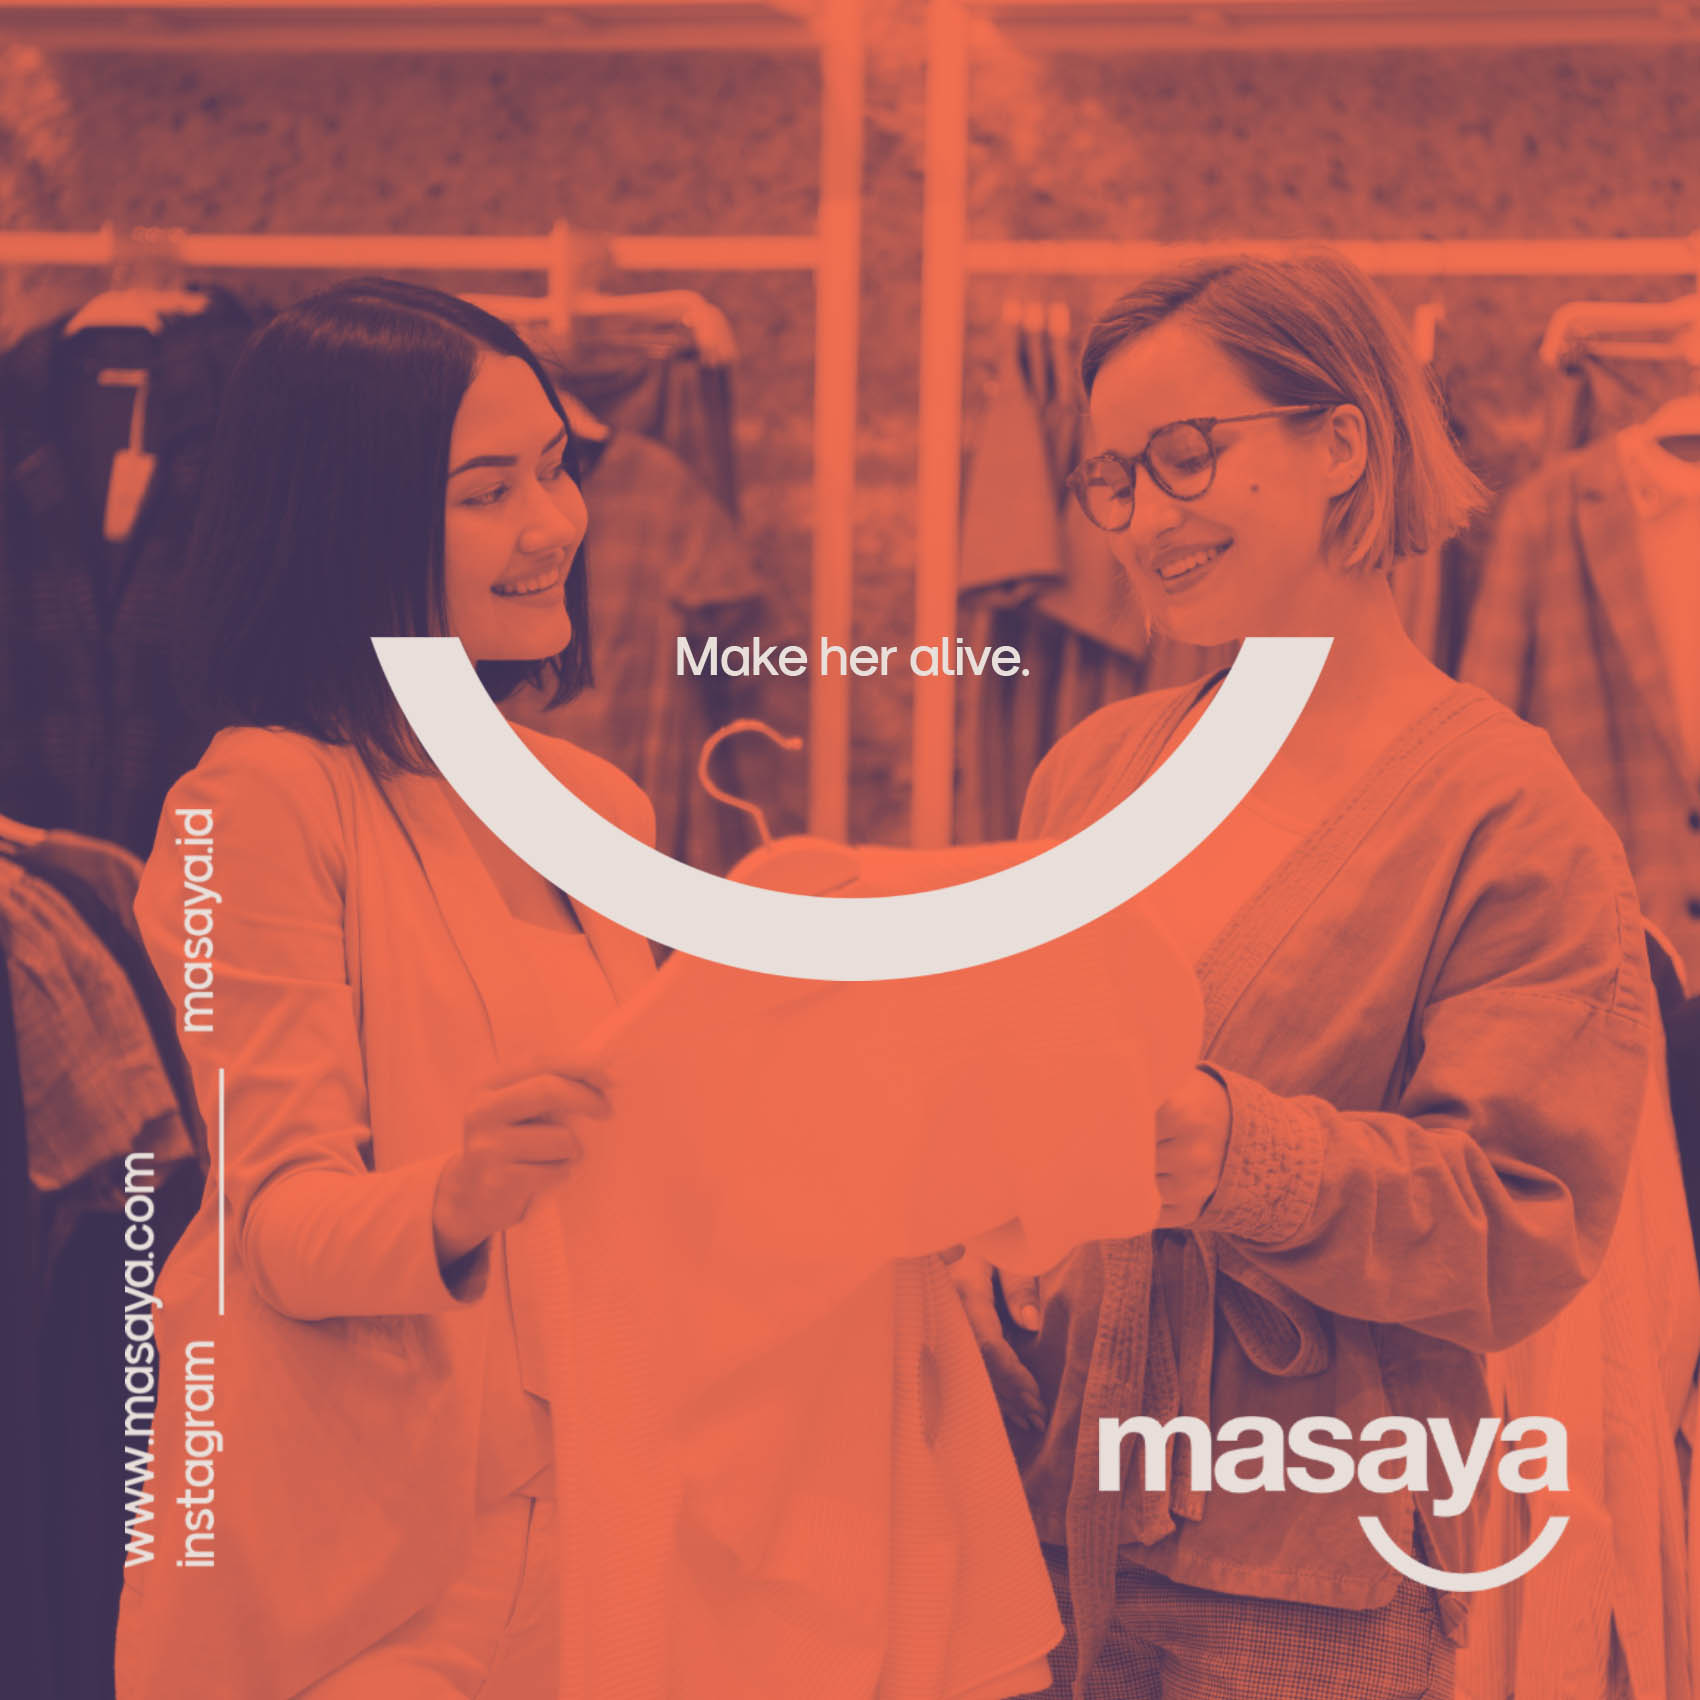 Widarto Impact Designing Brand Identity for Masaya Brand, New Women Fashion Line Startups